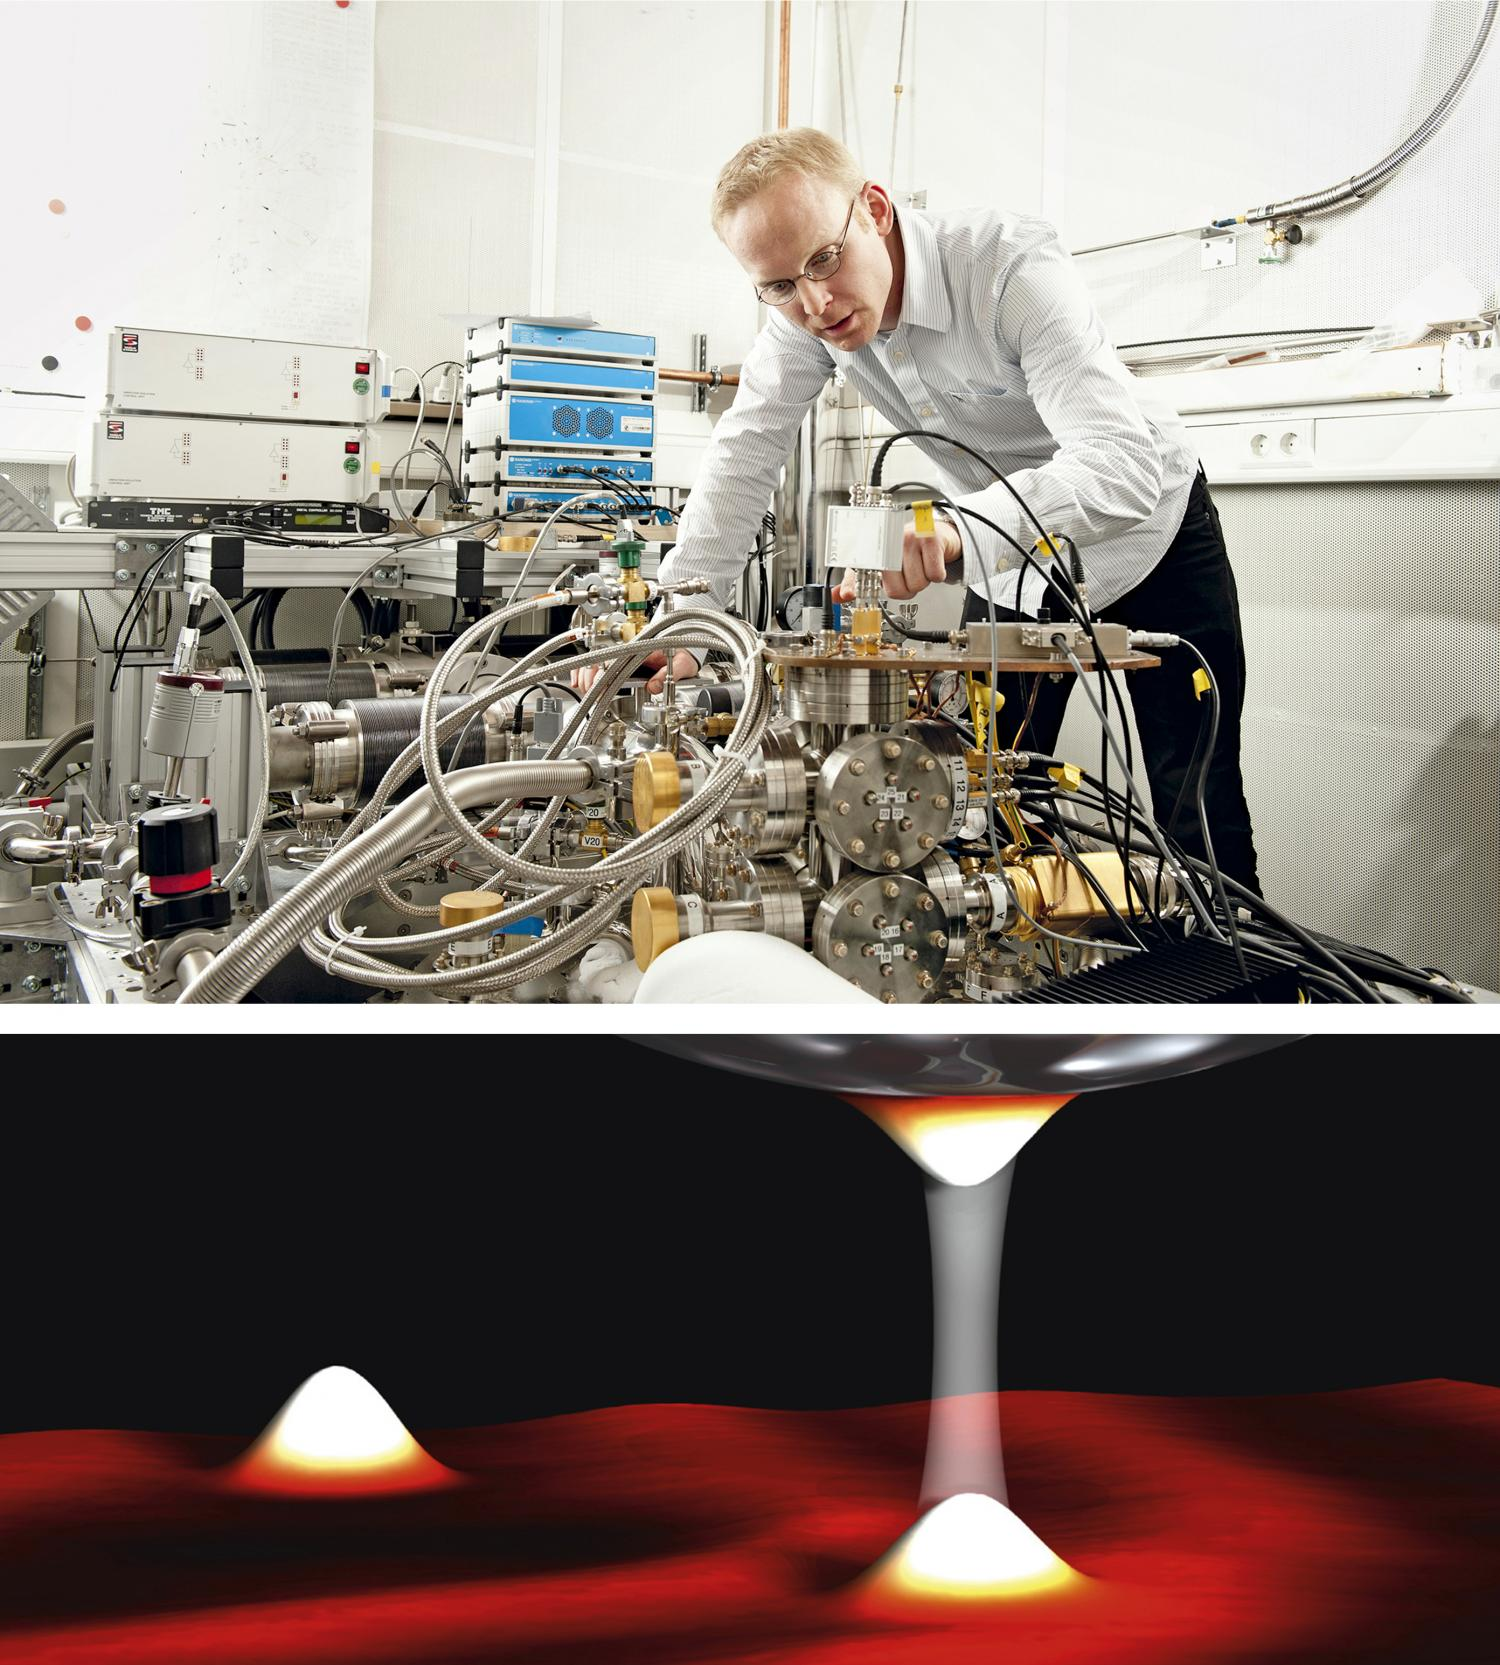 Close to absolute zero, electrons exhibit their quantum nature